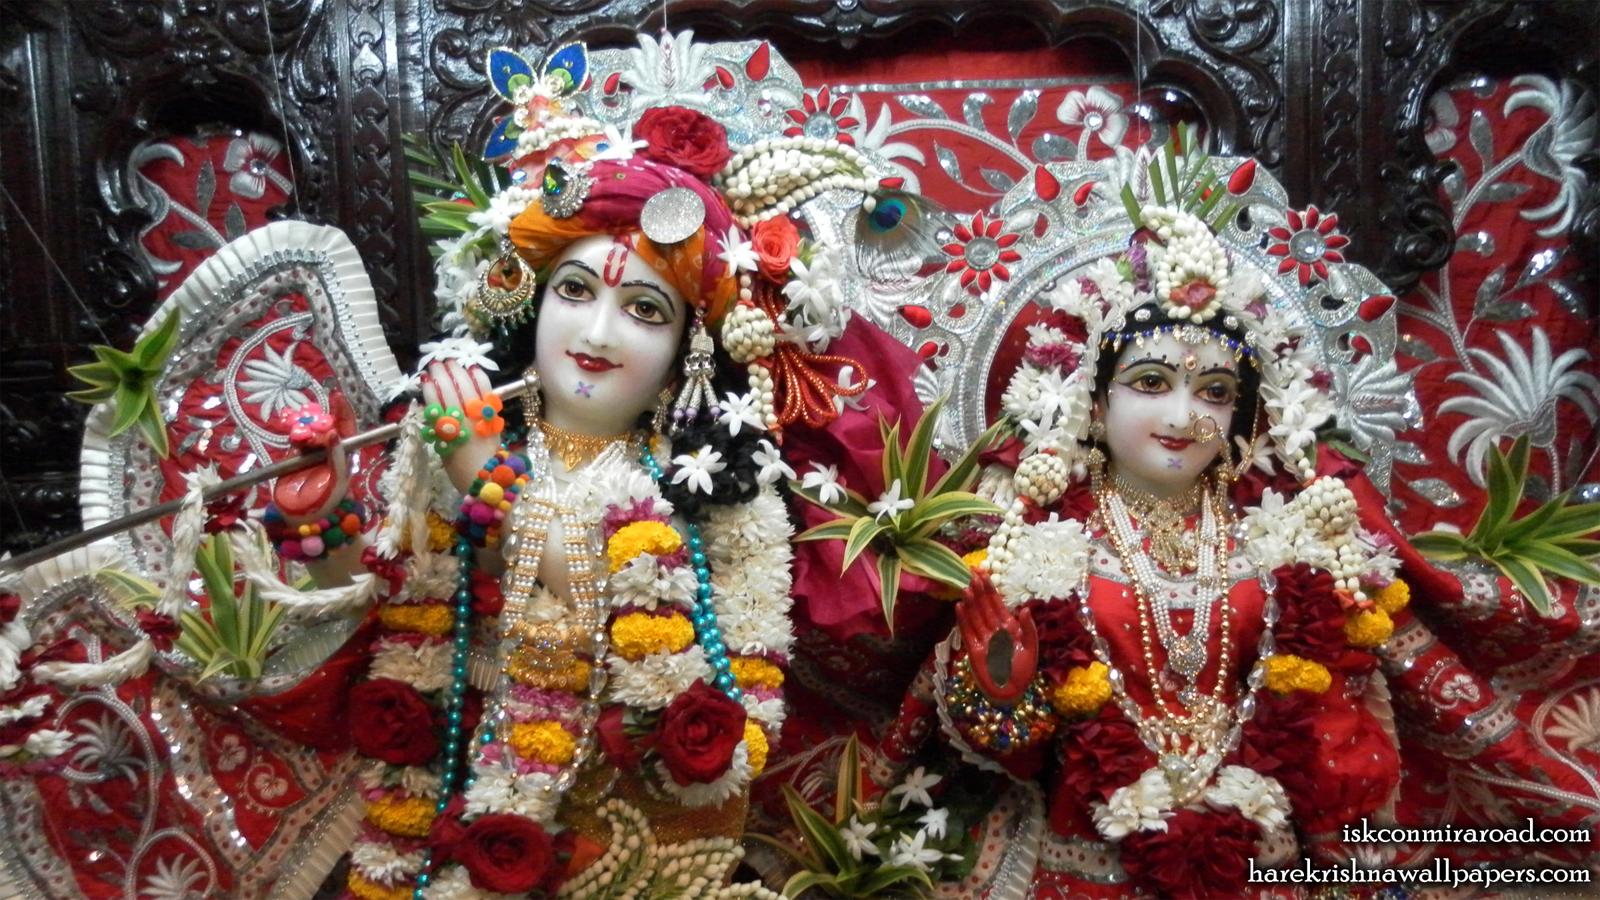 Sri Sri Radha Giridhari Close up Wallpaper (016) Size 1600x900 Download